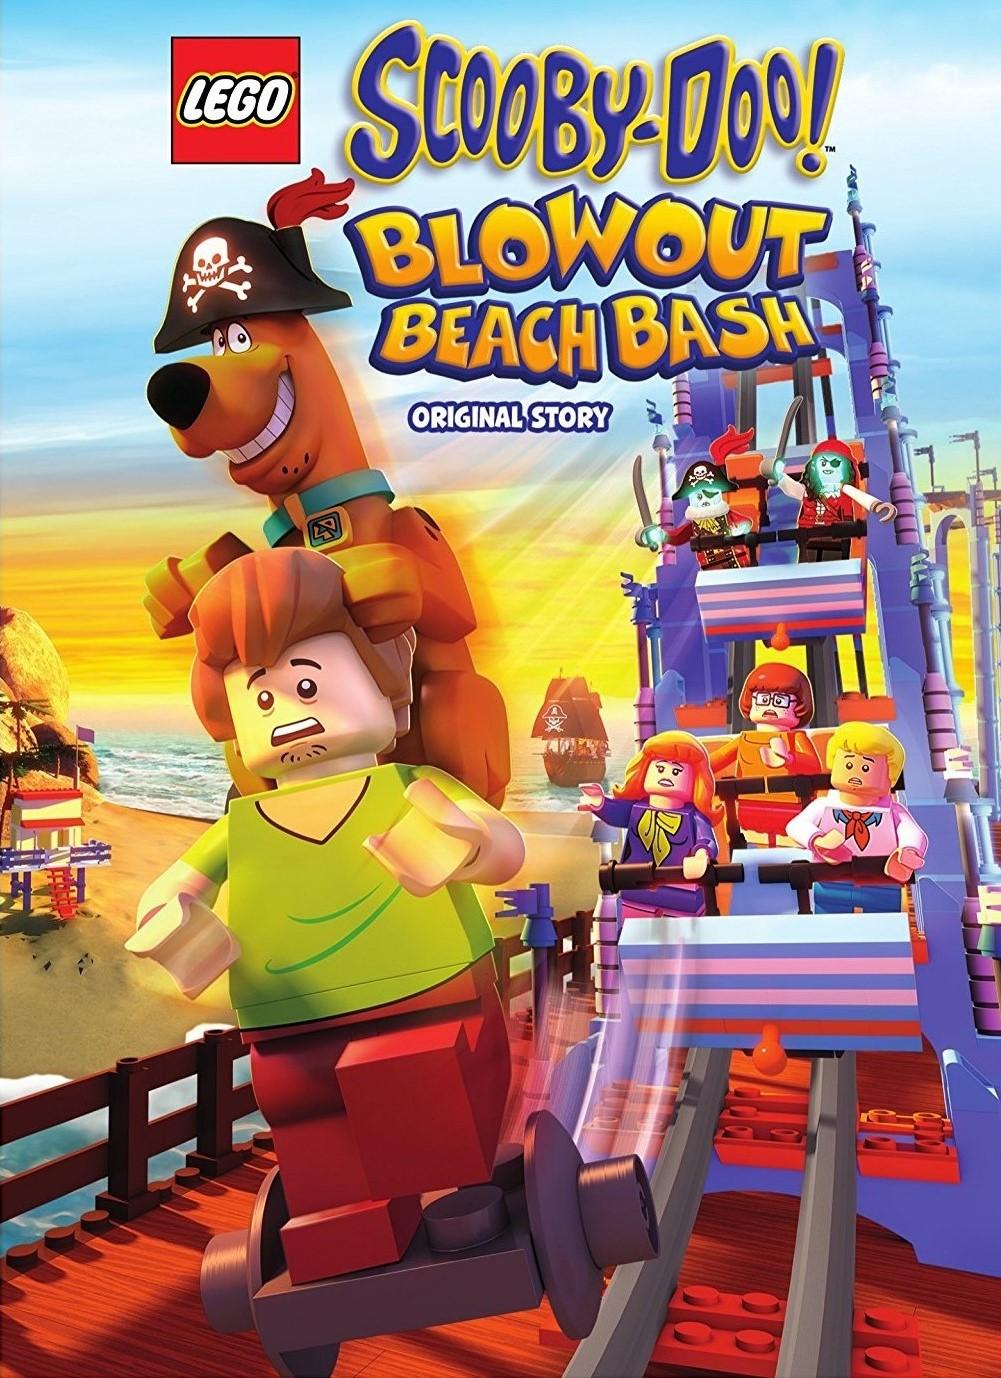 Lego Scooby-Doo! Lanetli Plaj Türkçe Dublaj izle